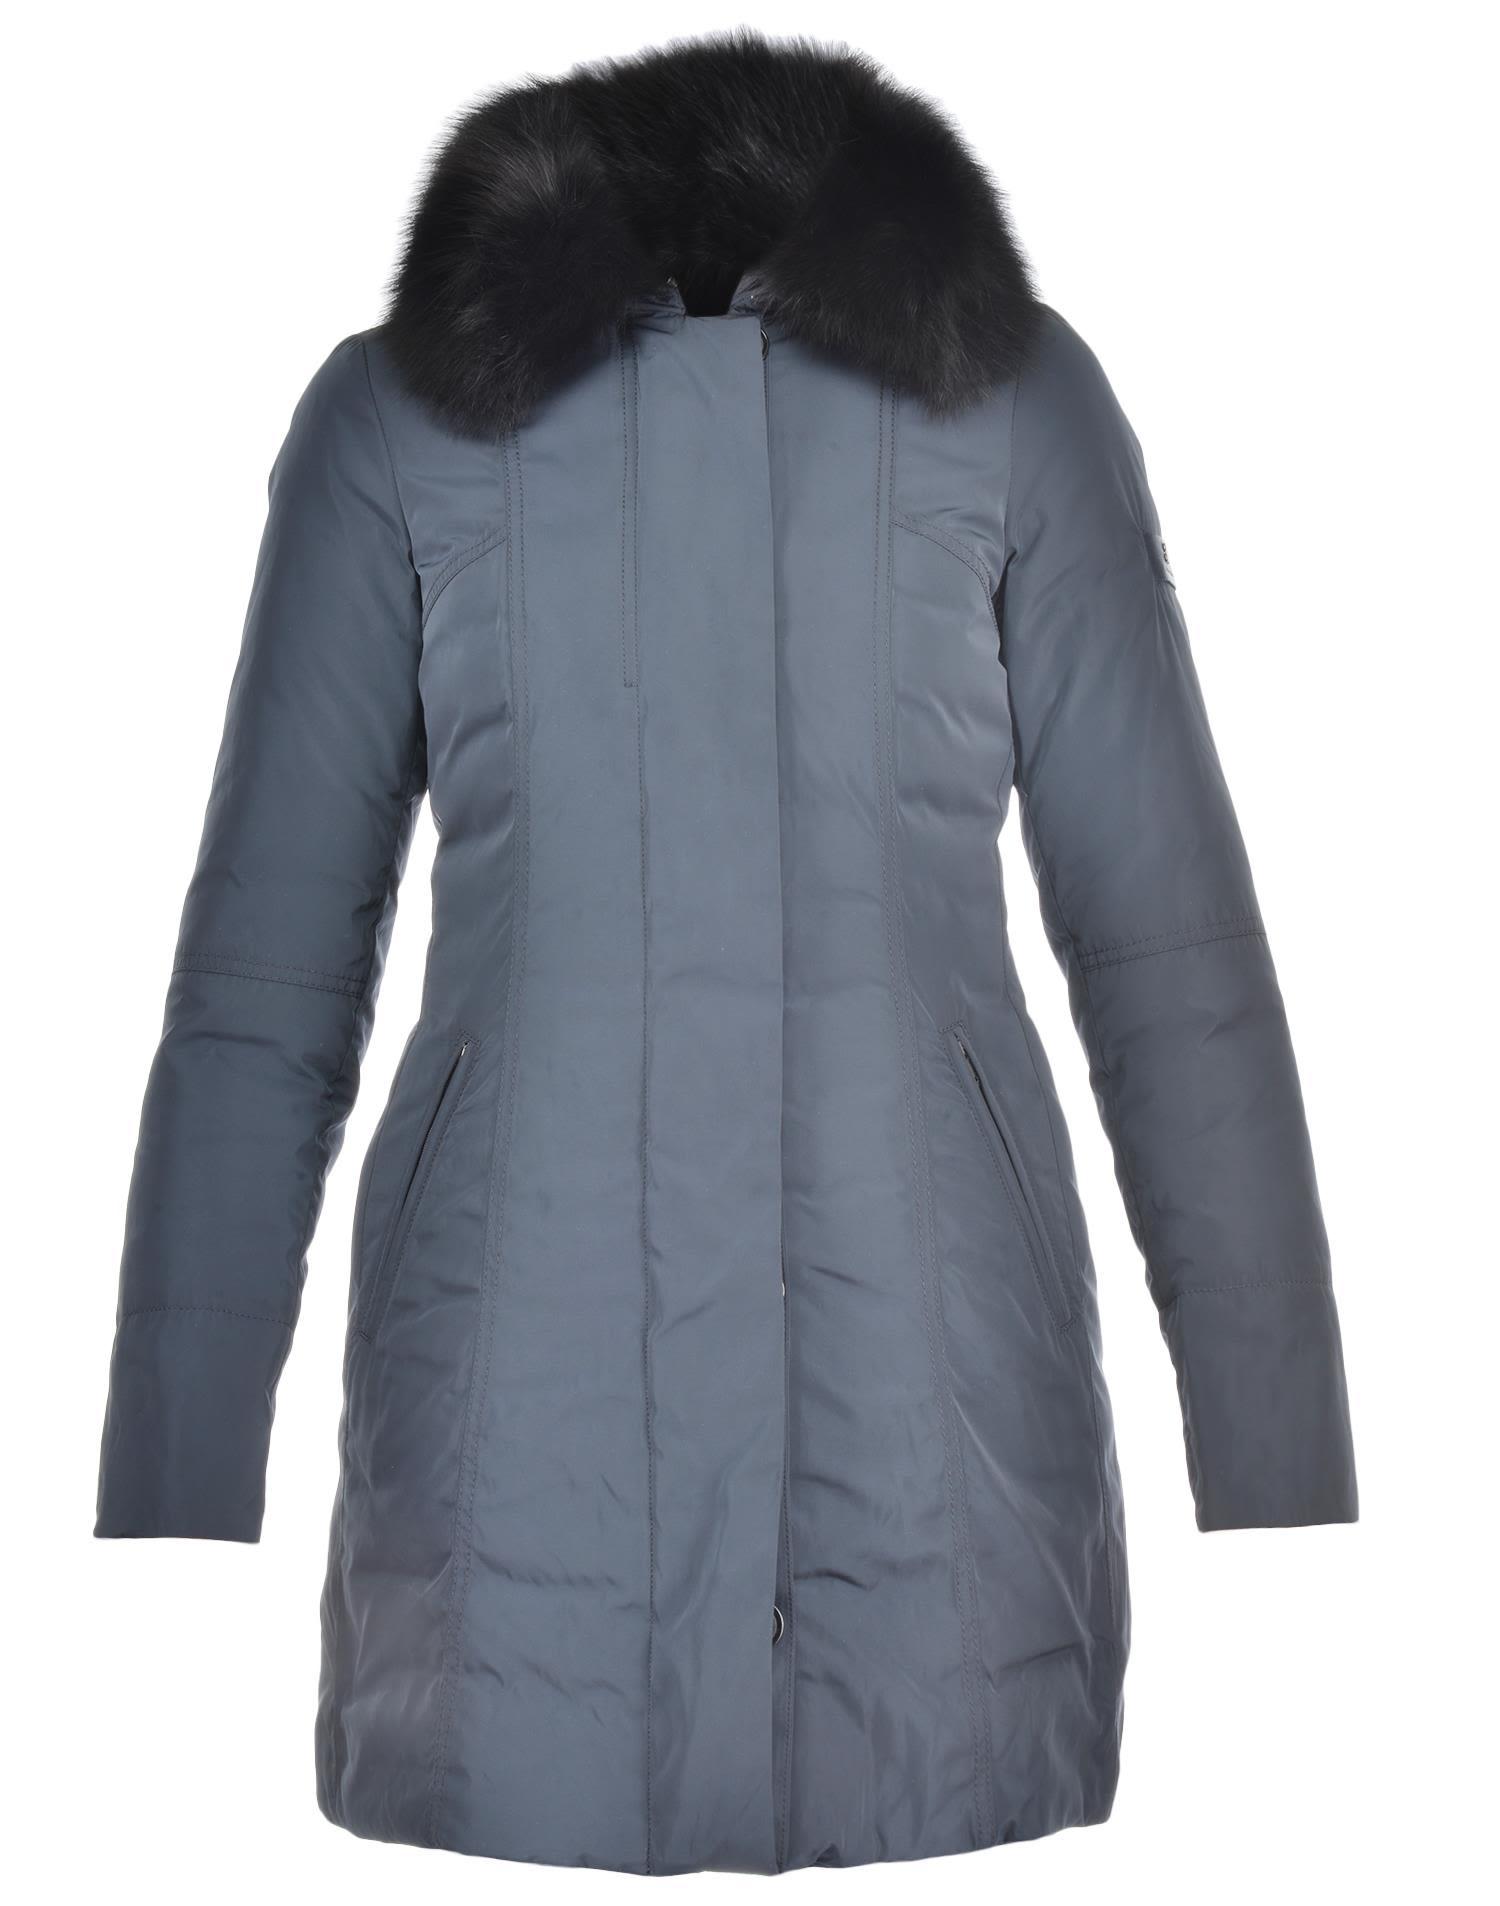 Peuterey Metropolitan Down Jacket